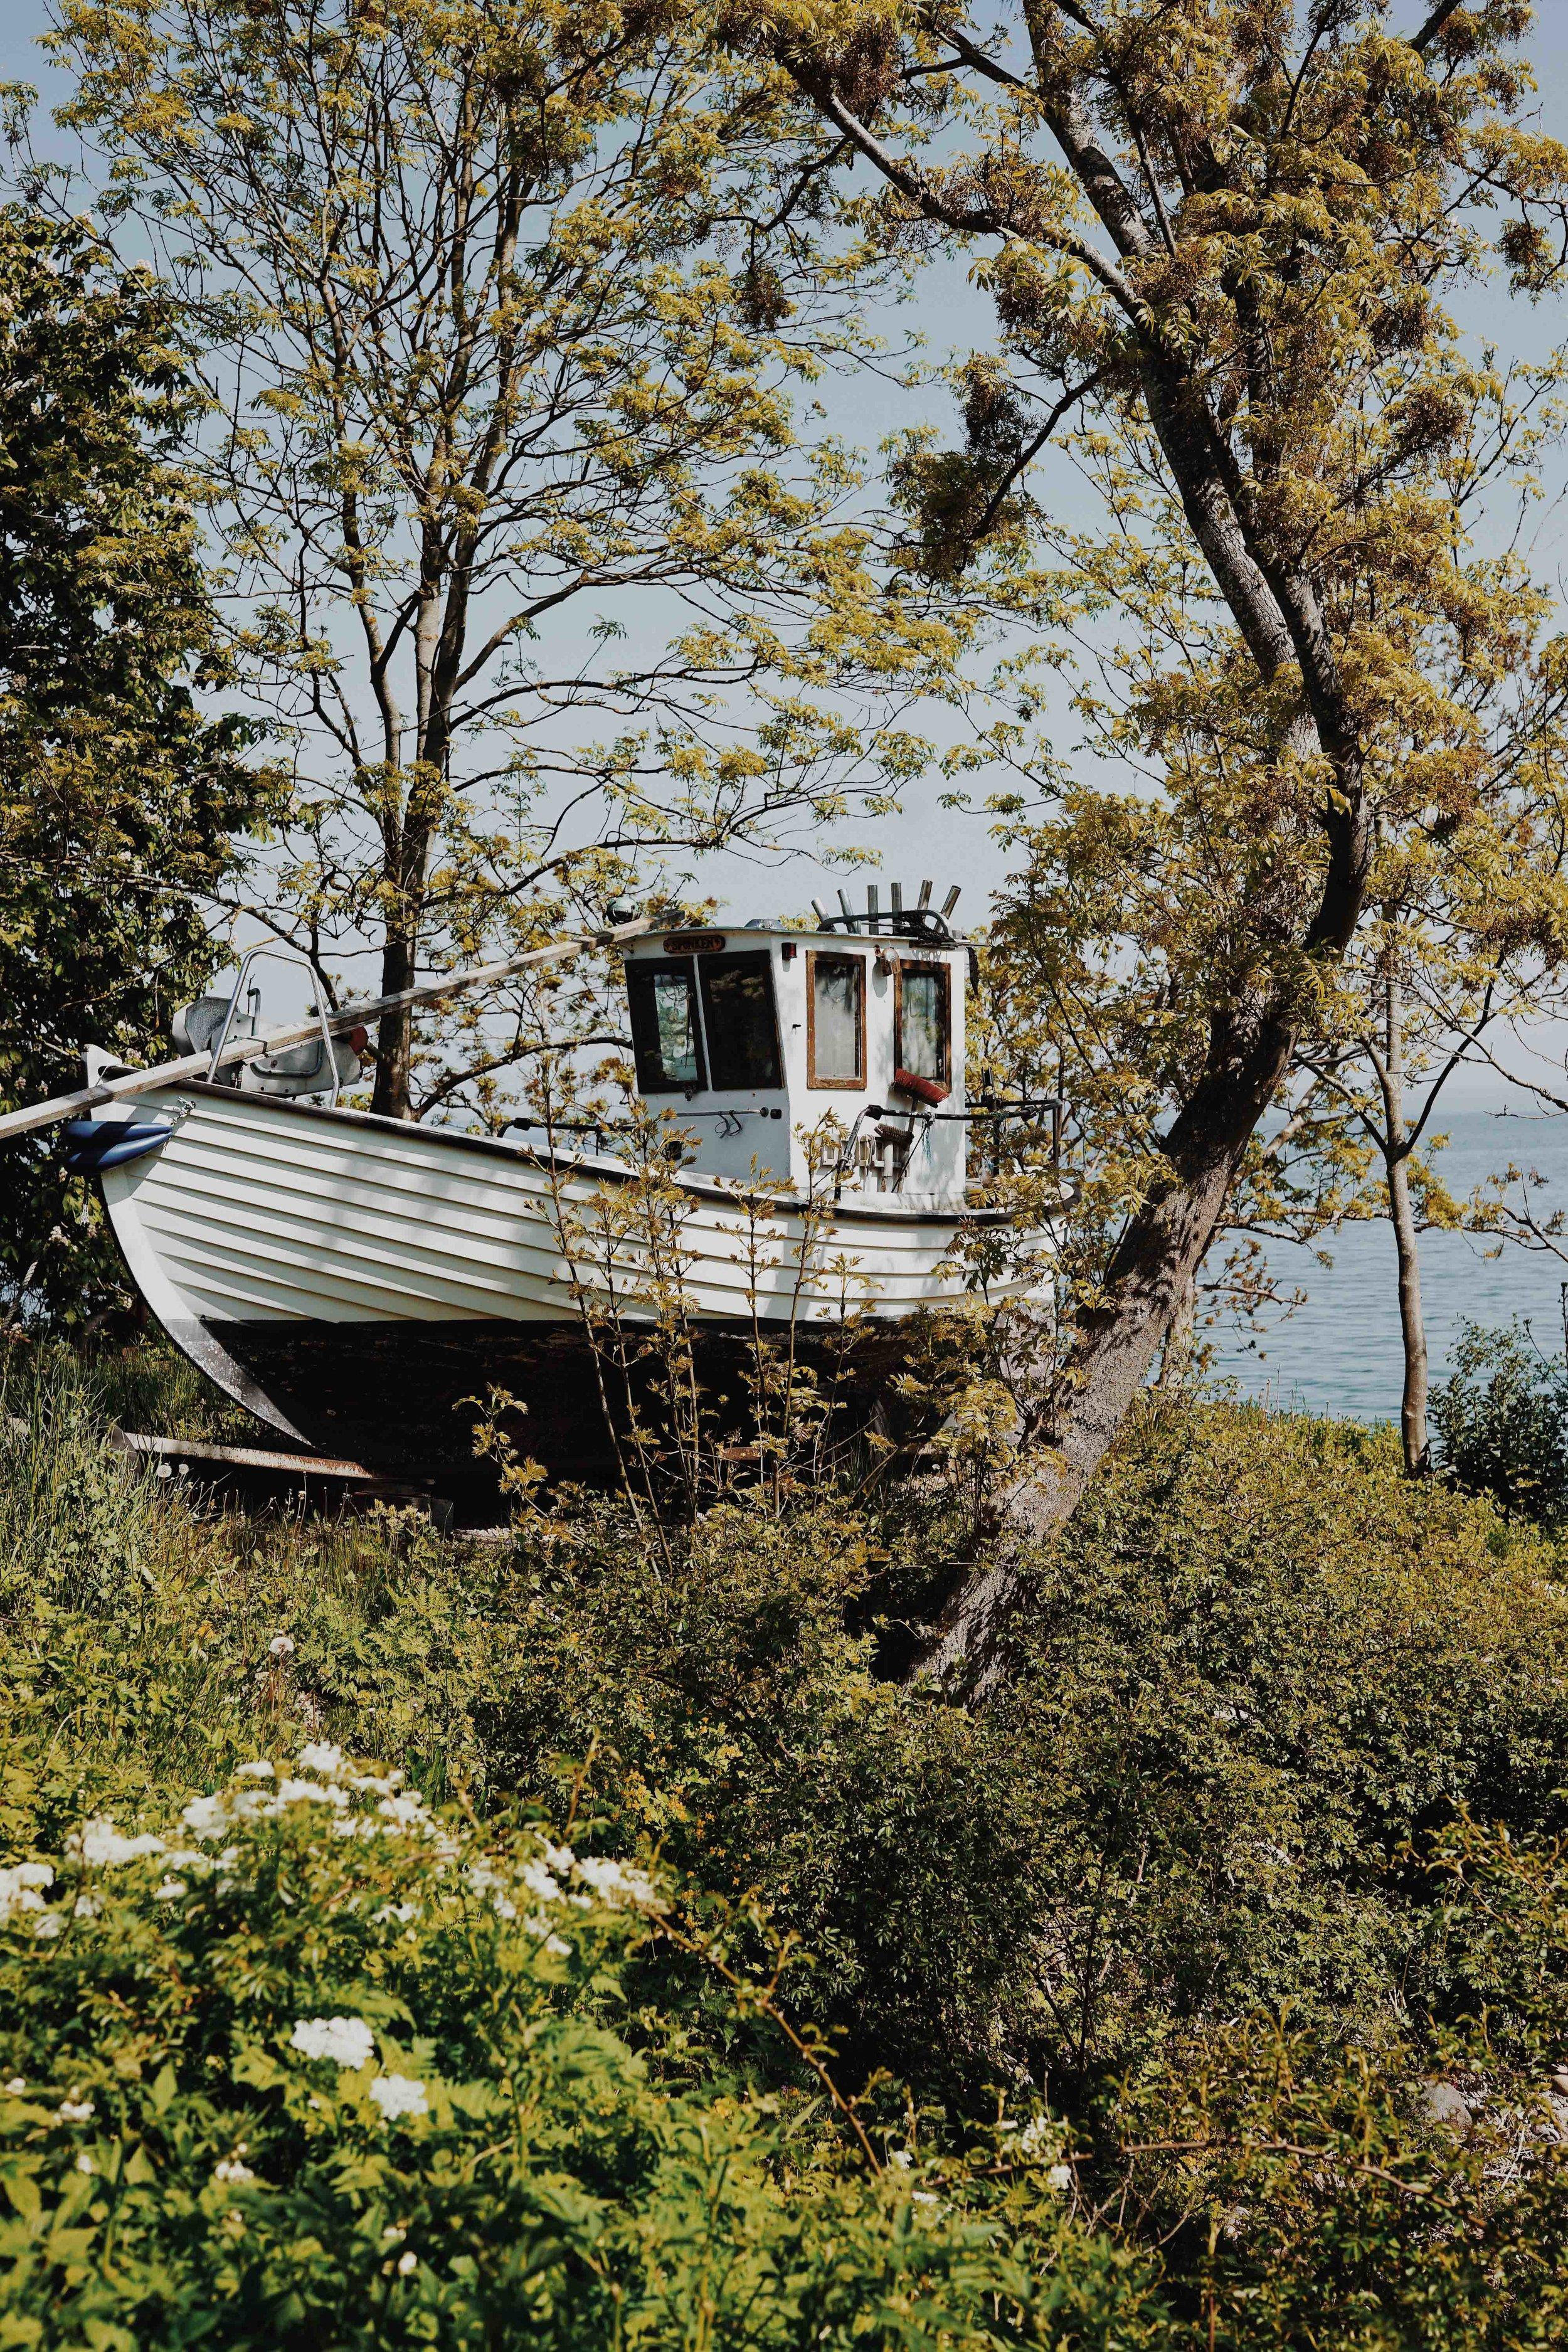 ASROSENVINGE_VisitSkane_Sweden_Kattvik_Harbour_Boat_LowRes-186.jpg